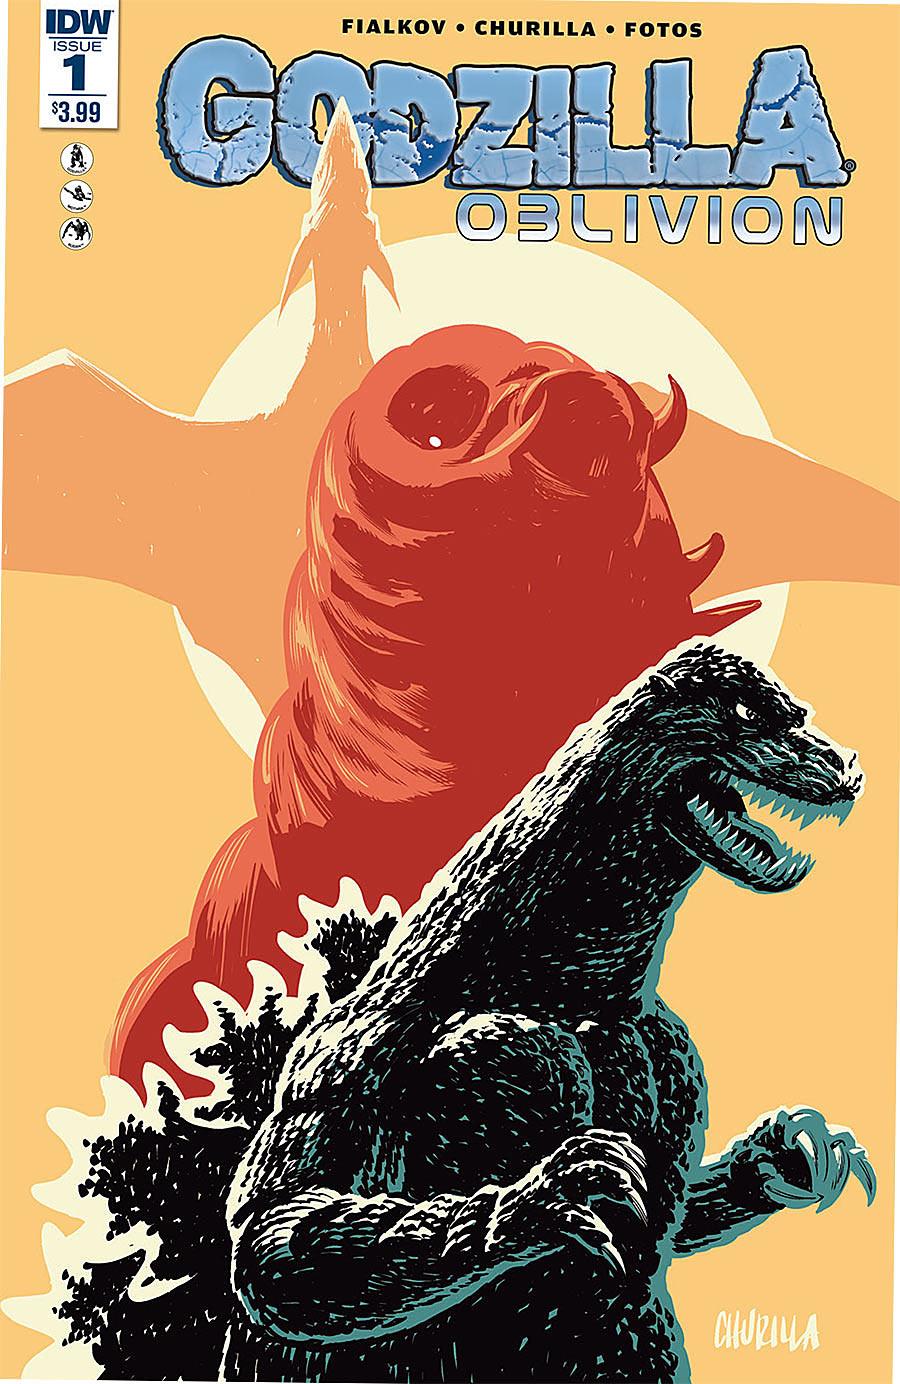 Godzilla-Oblivion-01-pr-1-ab1dc